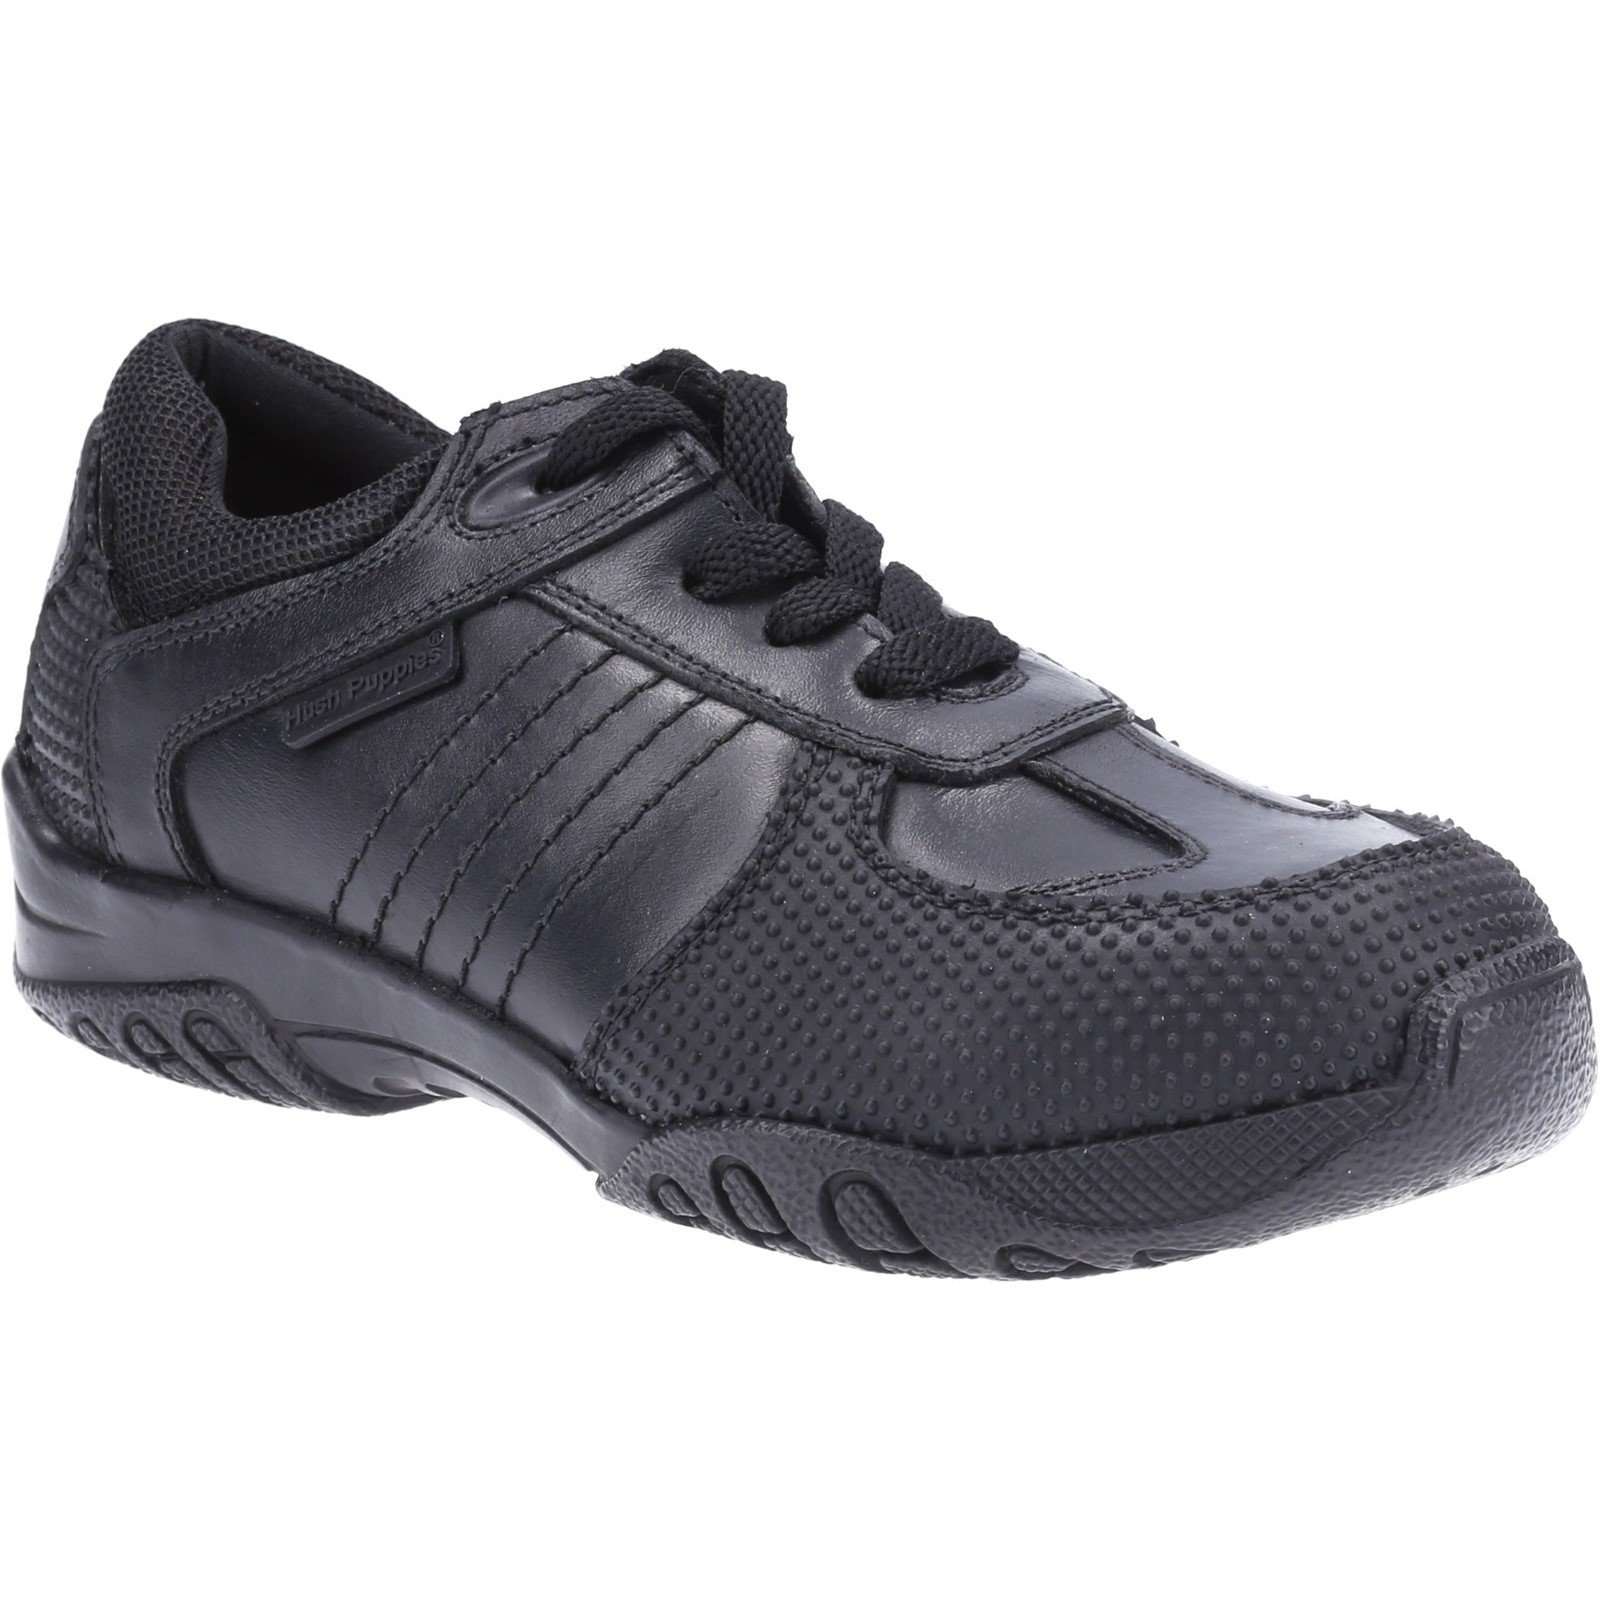 Hush Puppies Kid's Jezza Junior School Shoe Black 32587 - Black 1